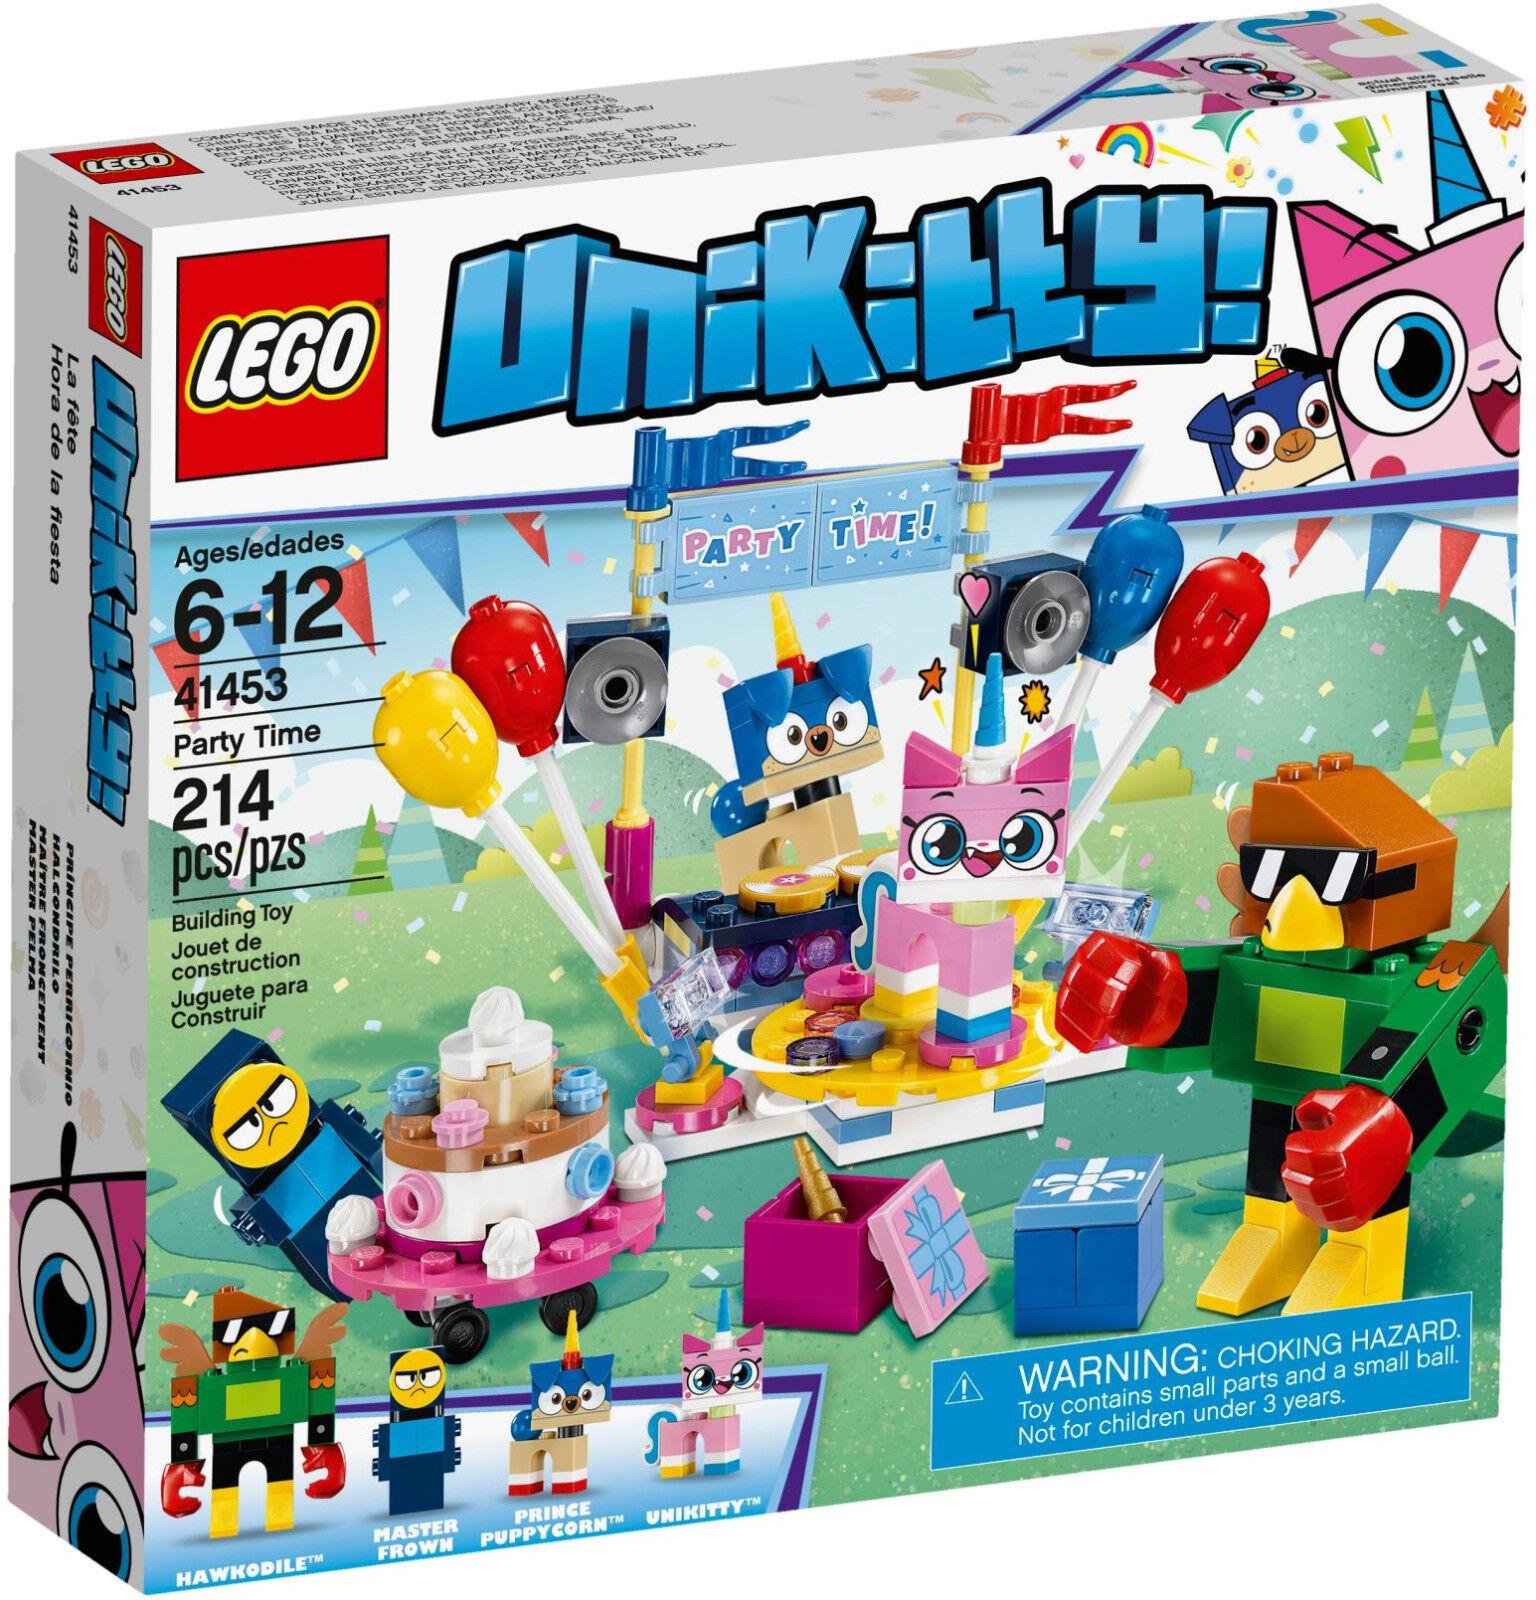 LEGO Unikitty - 41453 Partyspaß / Party Time mit Puppycorn & Hawkodile - Neu OVP